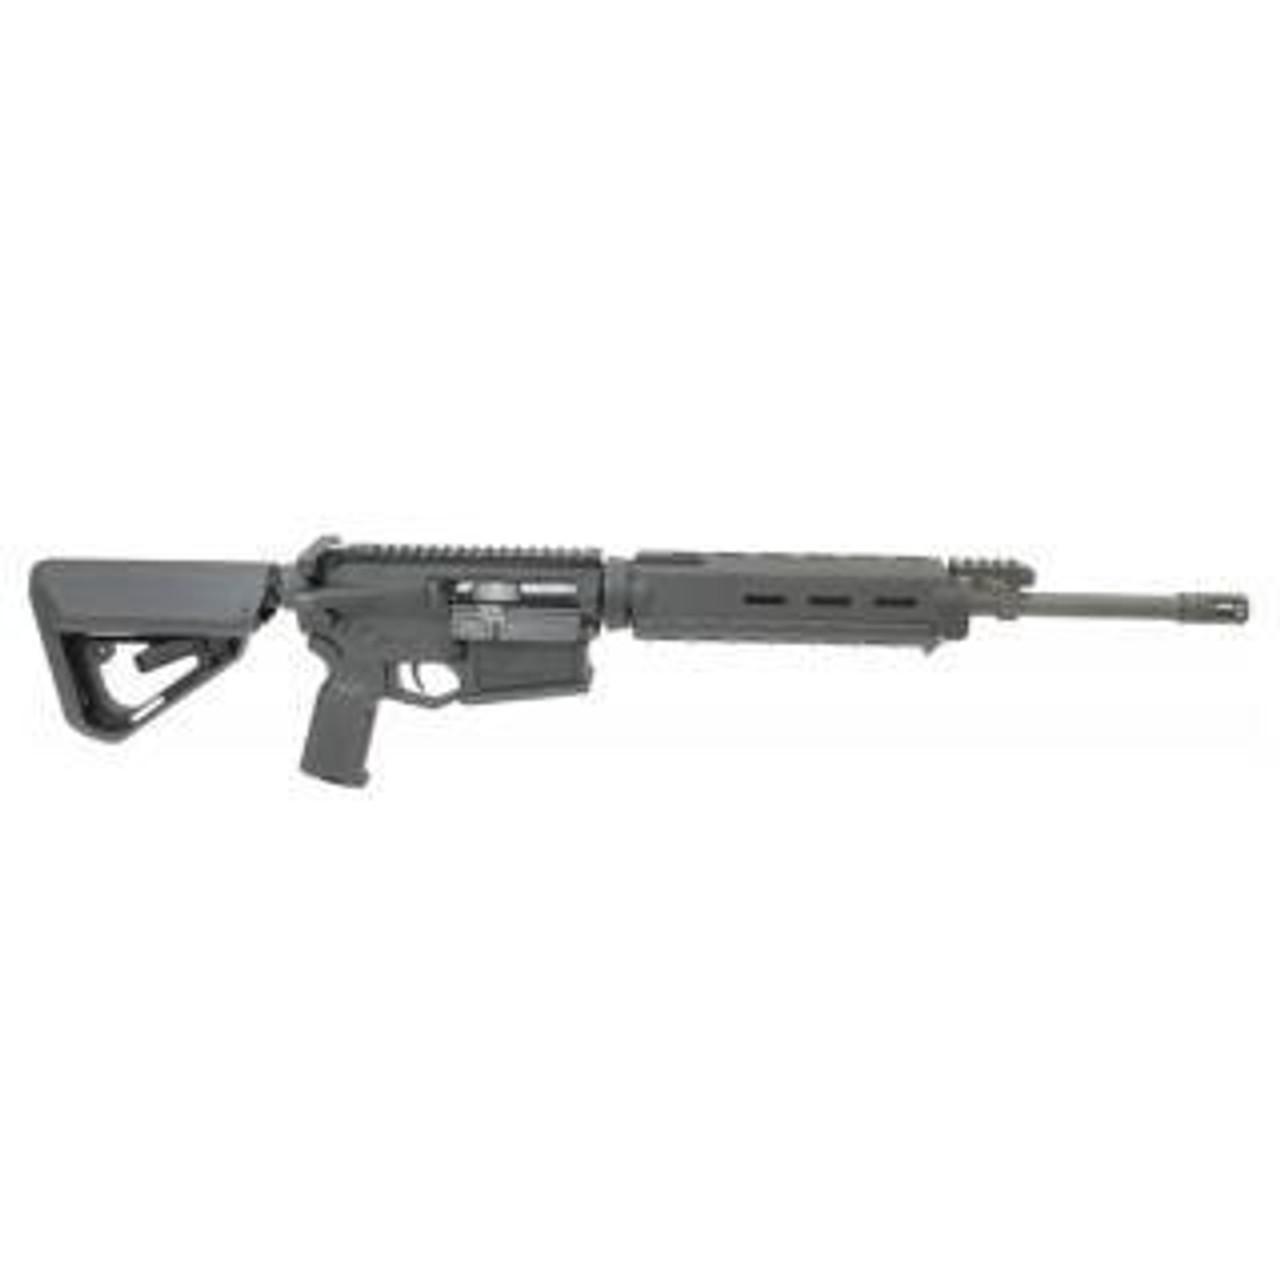 Adams Arms Patrol Rifle CALIFORNIA LEGAL-.308